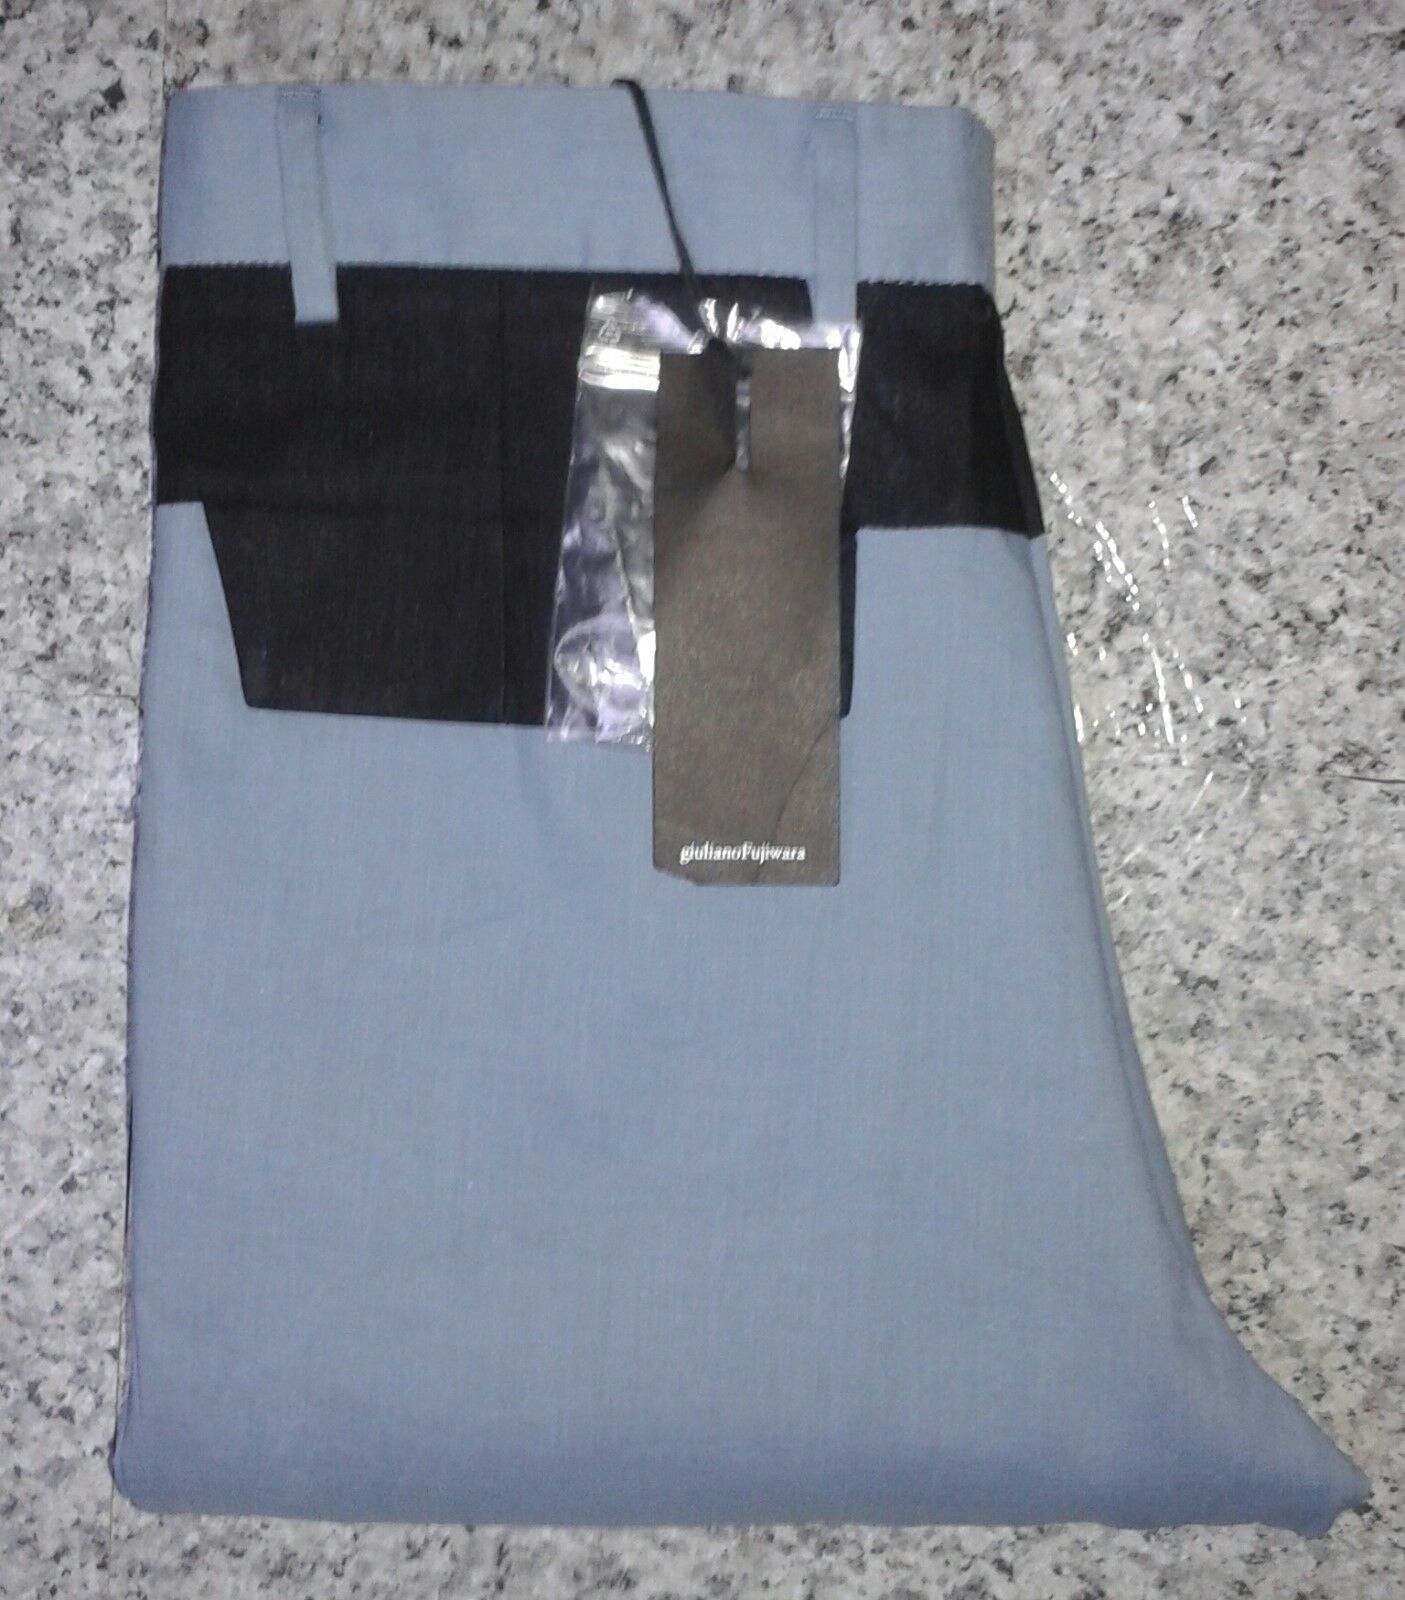 Giuliano FUJIWARA PU06 Blu Nero Contrasto RITAGLIATA Pantaloni Pantaloni   W28 L20